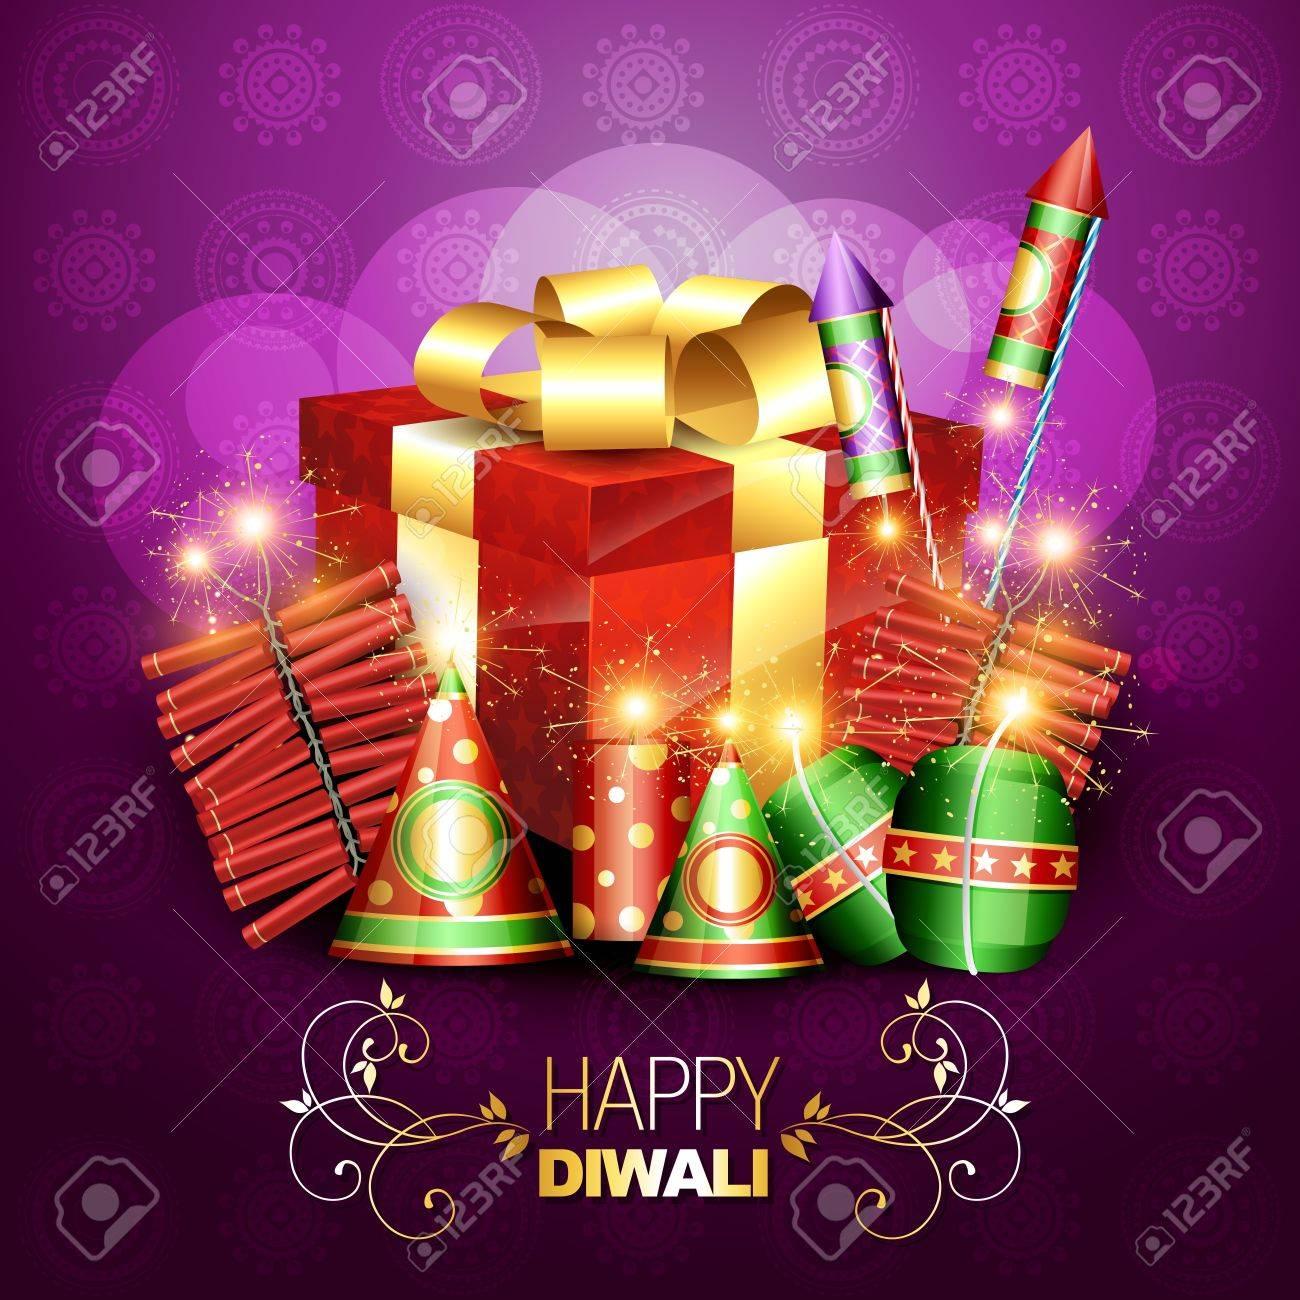 stylish diwali crackers with gift box design illustration Stock Vector - 15656236